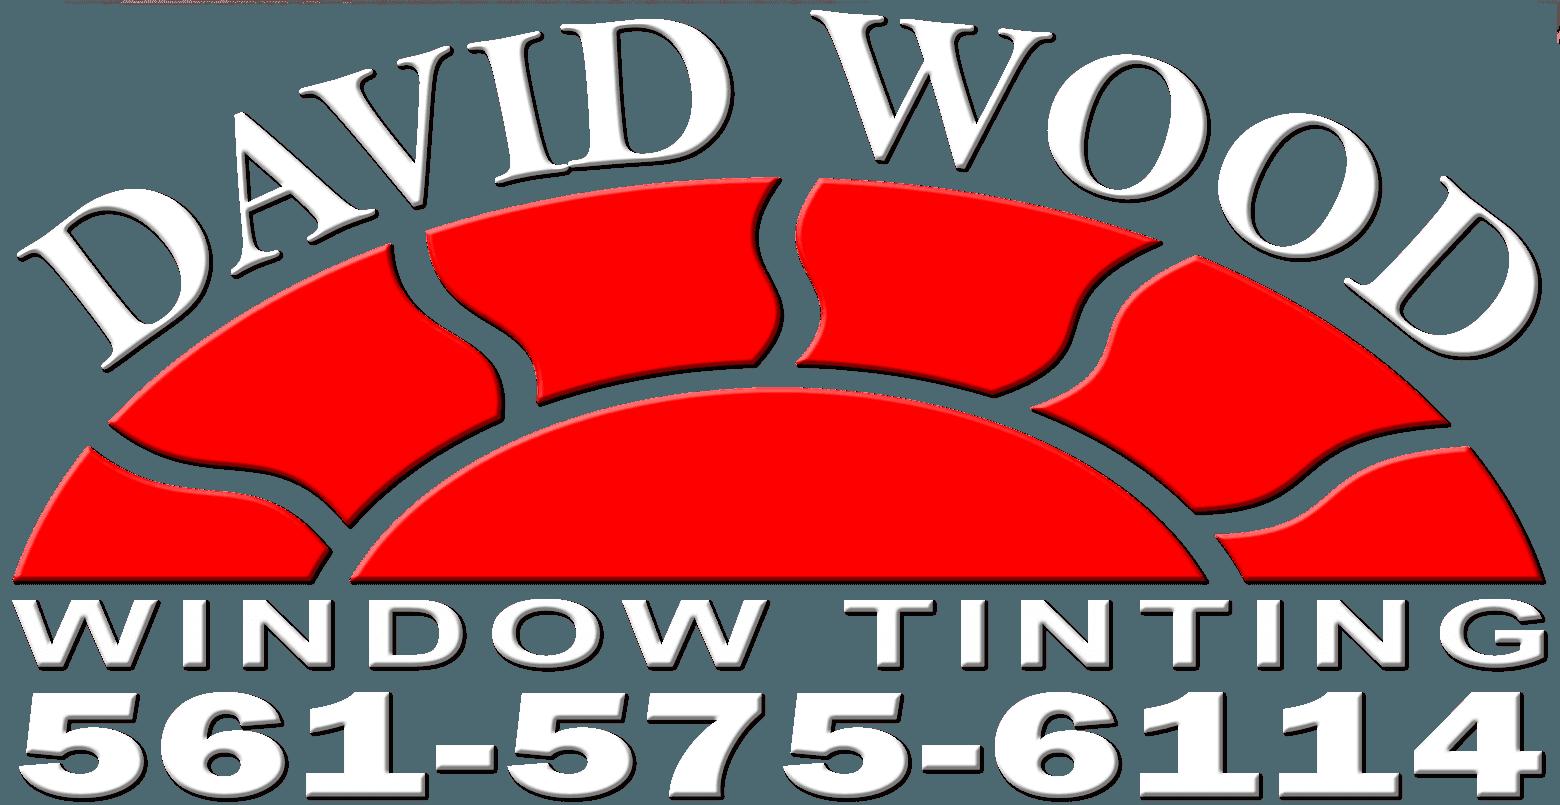 David Wood Window Tinting